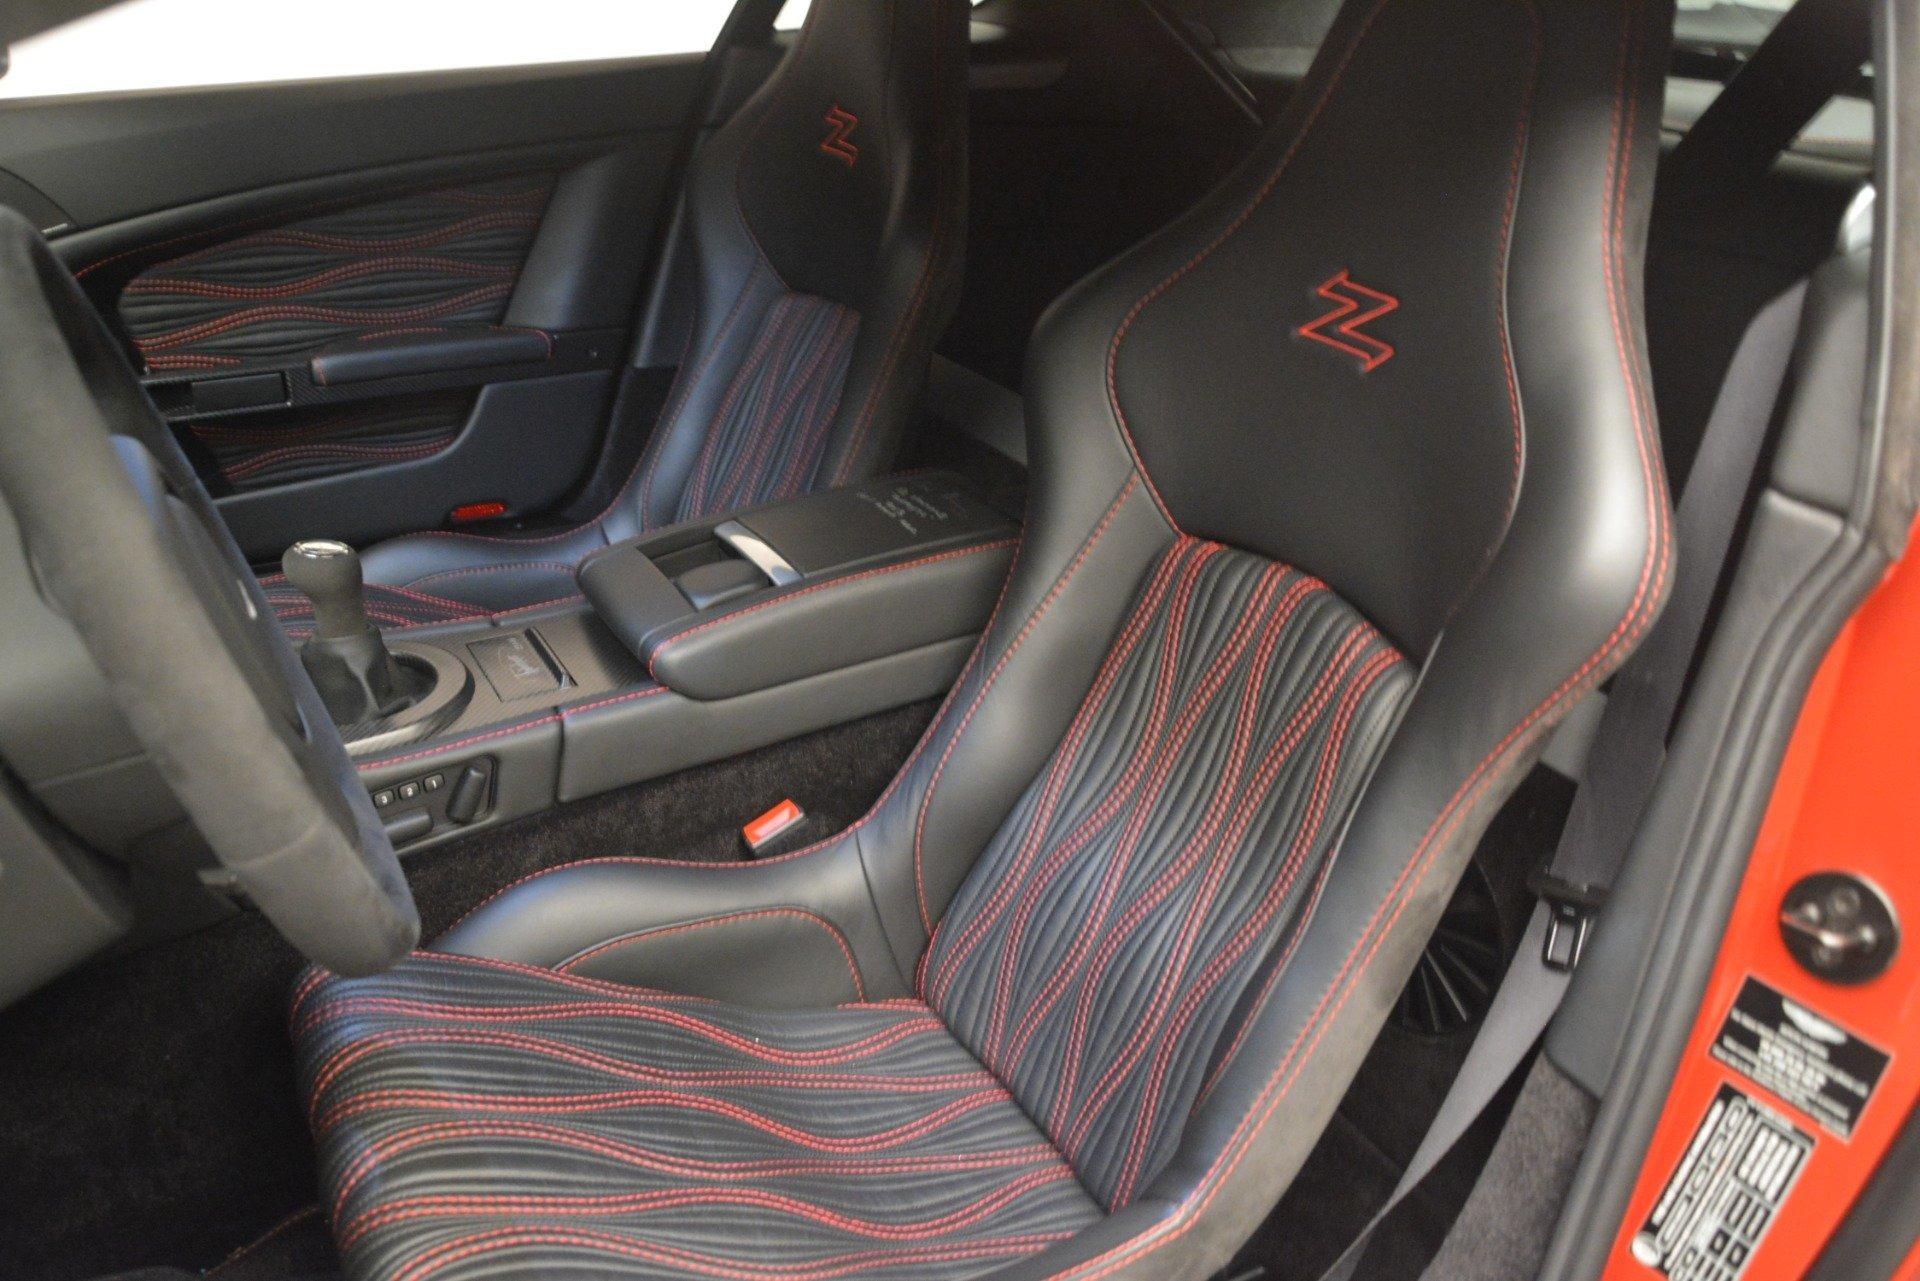 Used 2013 Aston Martin V12 Zagato Coupe For Sale In Westport, CT 3181_p15